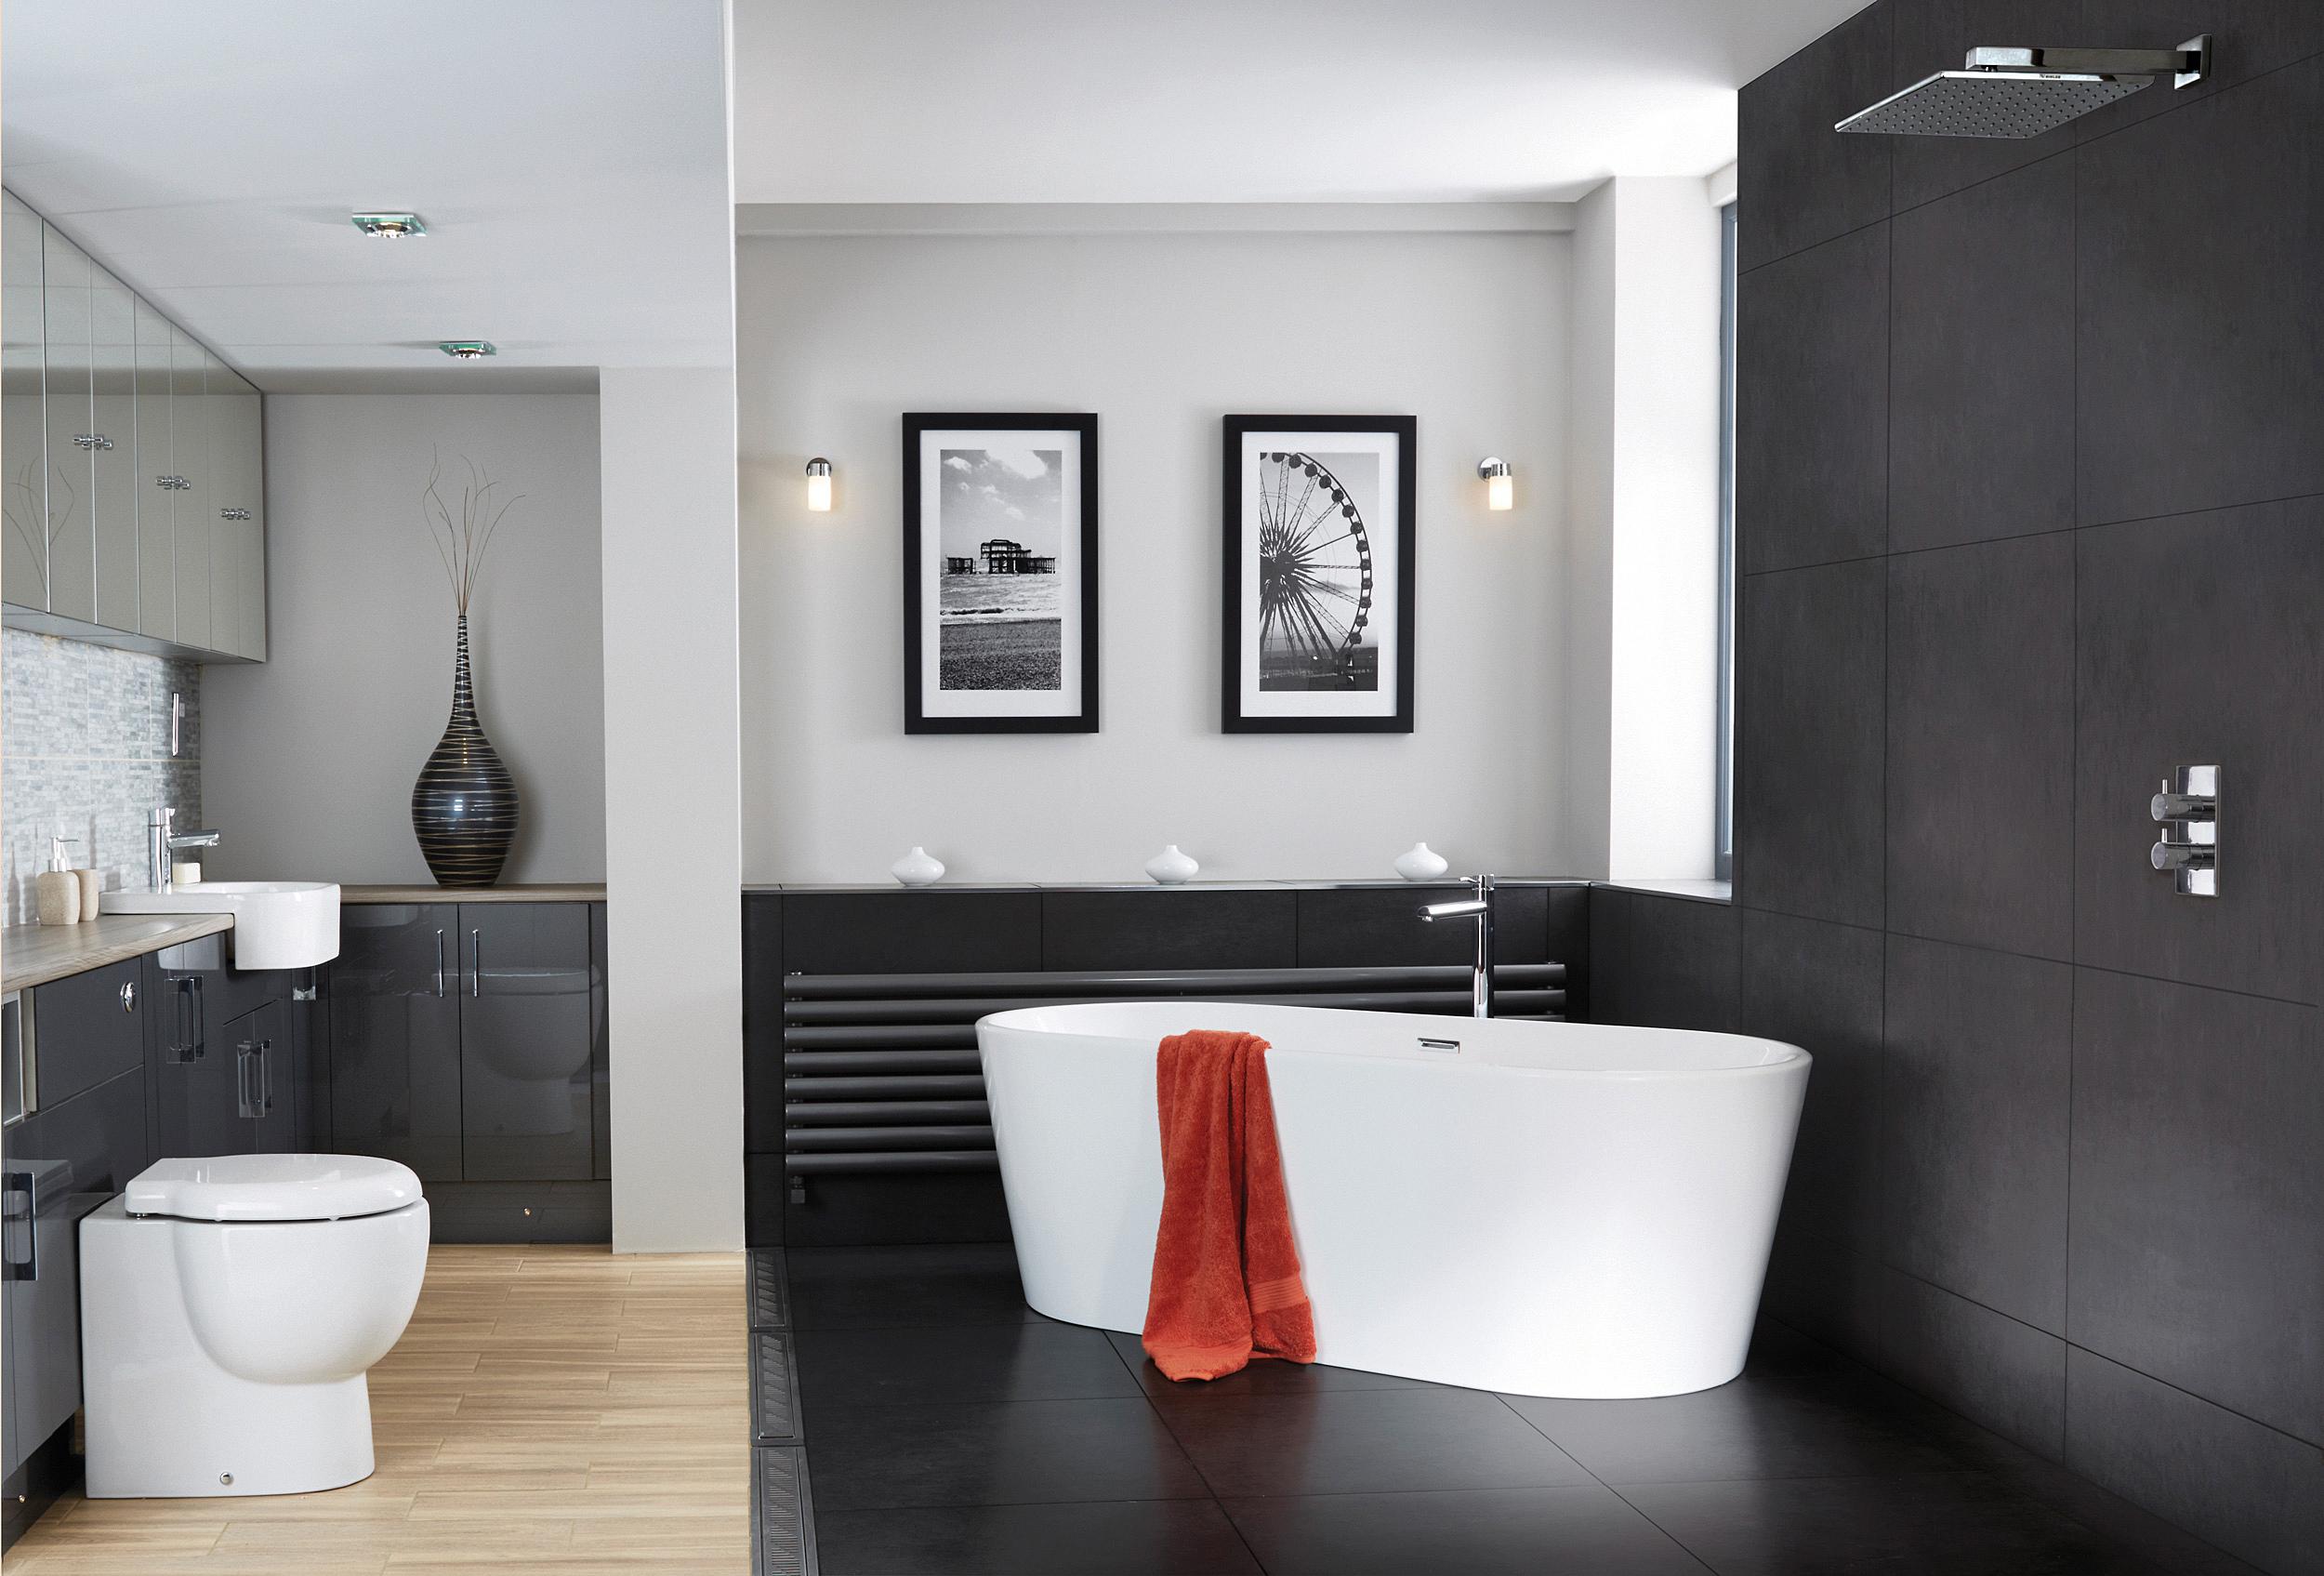 room-set-photographyNevo-Lifestyle.jpg